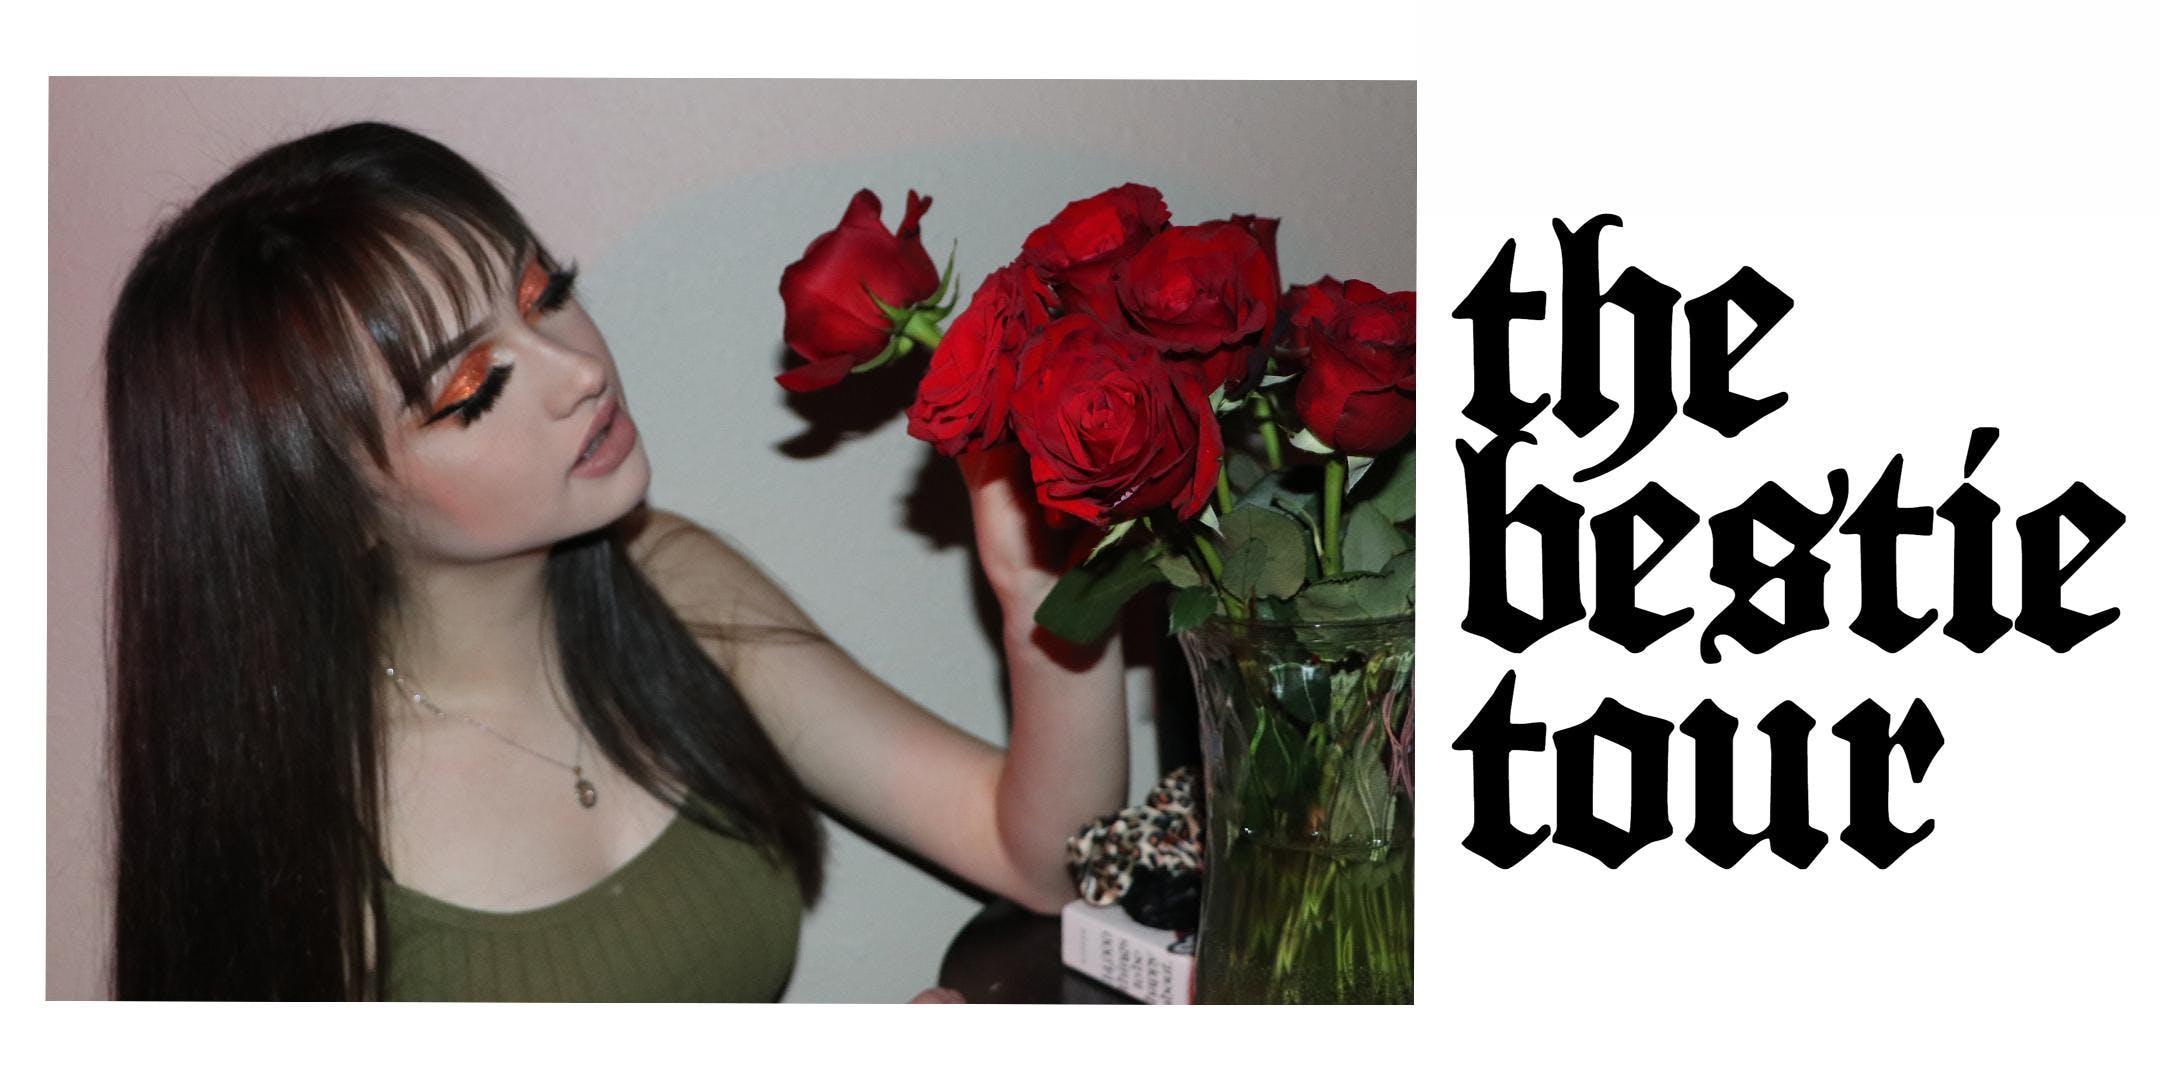 The Bestie Tour- Haley Morales - New York, NY